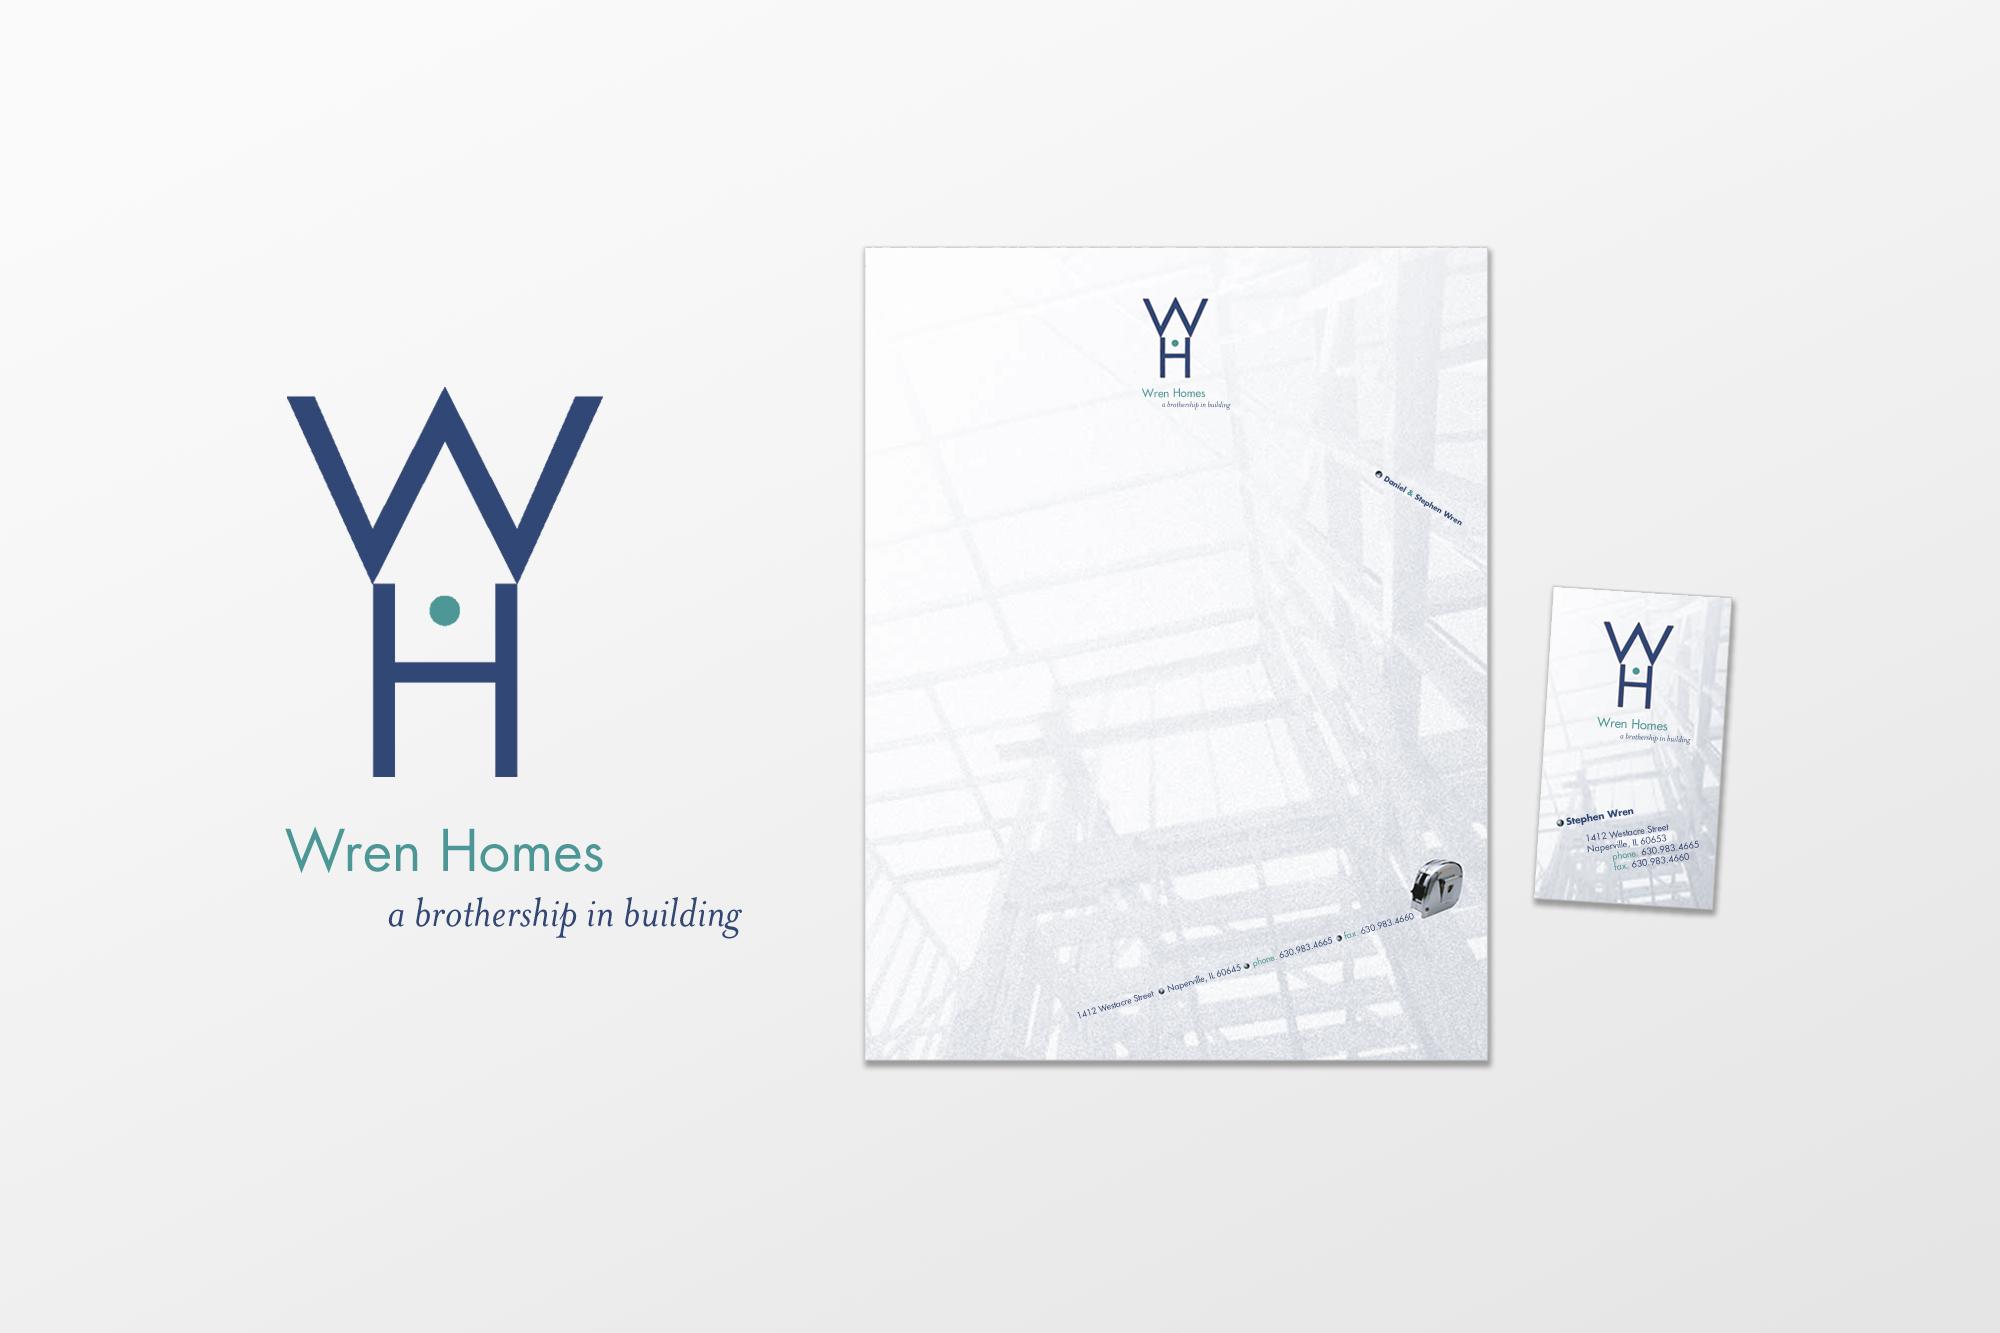 Wren Homes